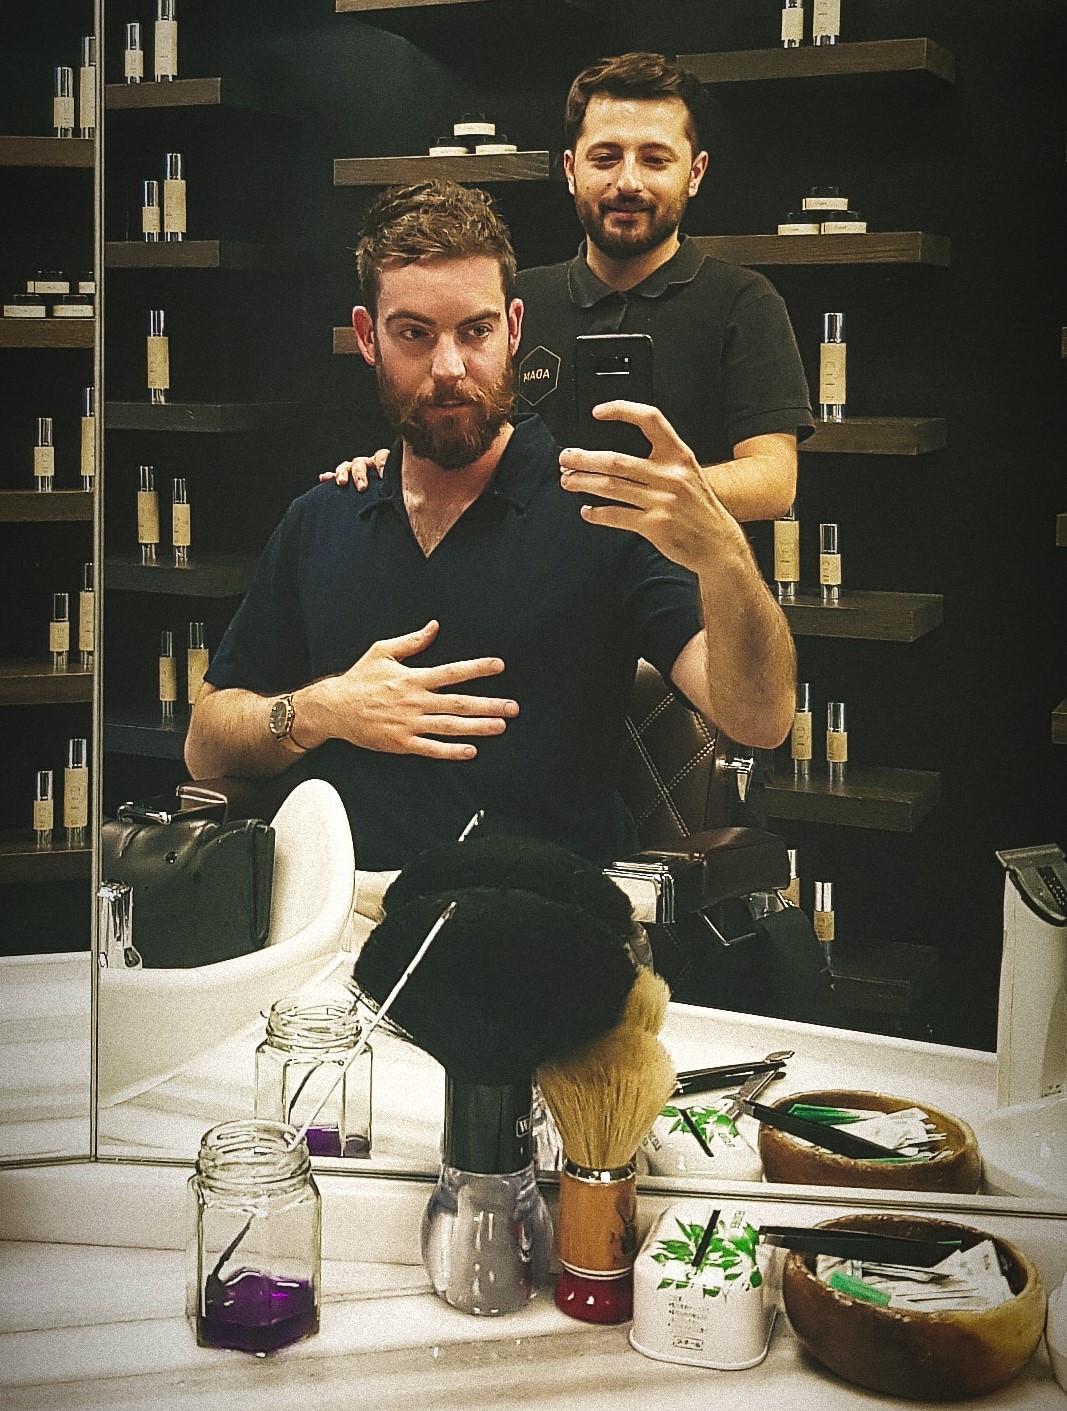 Good deed feed - ADAM Grooming match NHS donations - Haircut